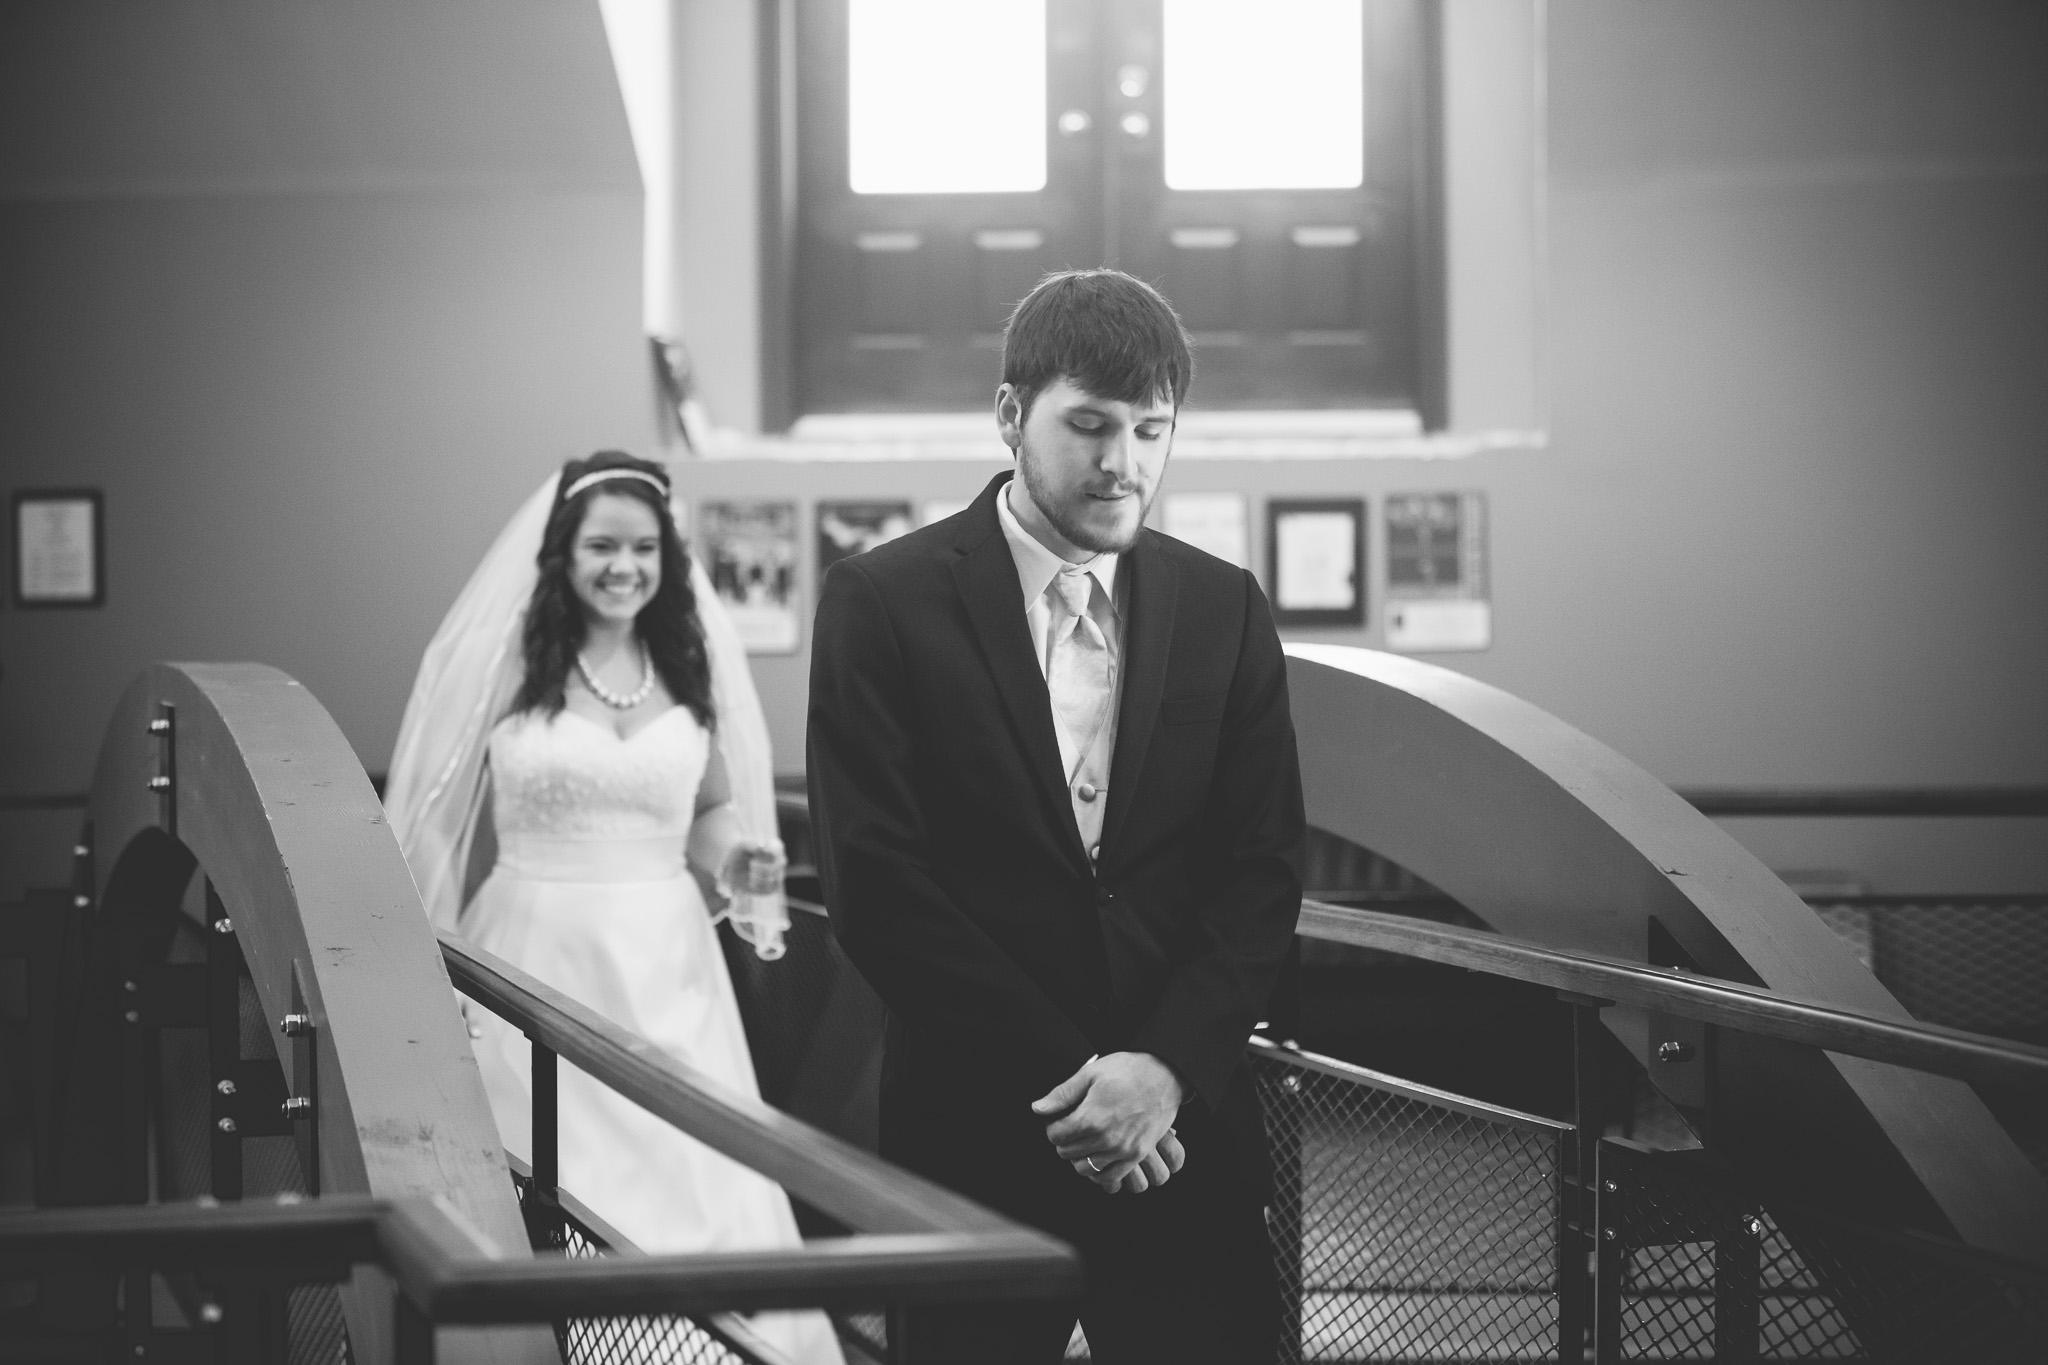 051-Jonathan-Kuhn-Photography-Victoria-Brandon-Wedding-WEB-1190.jpg